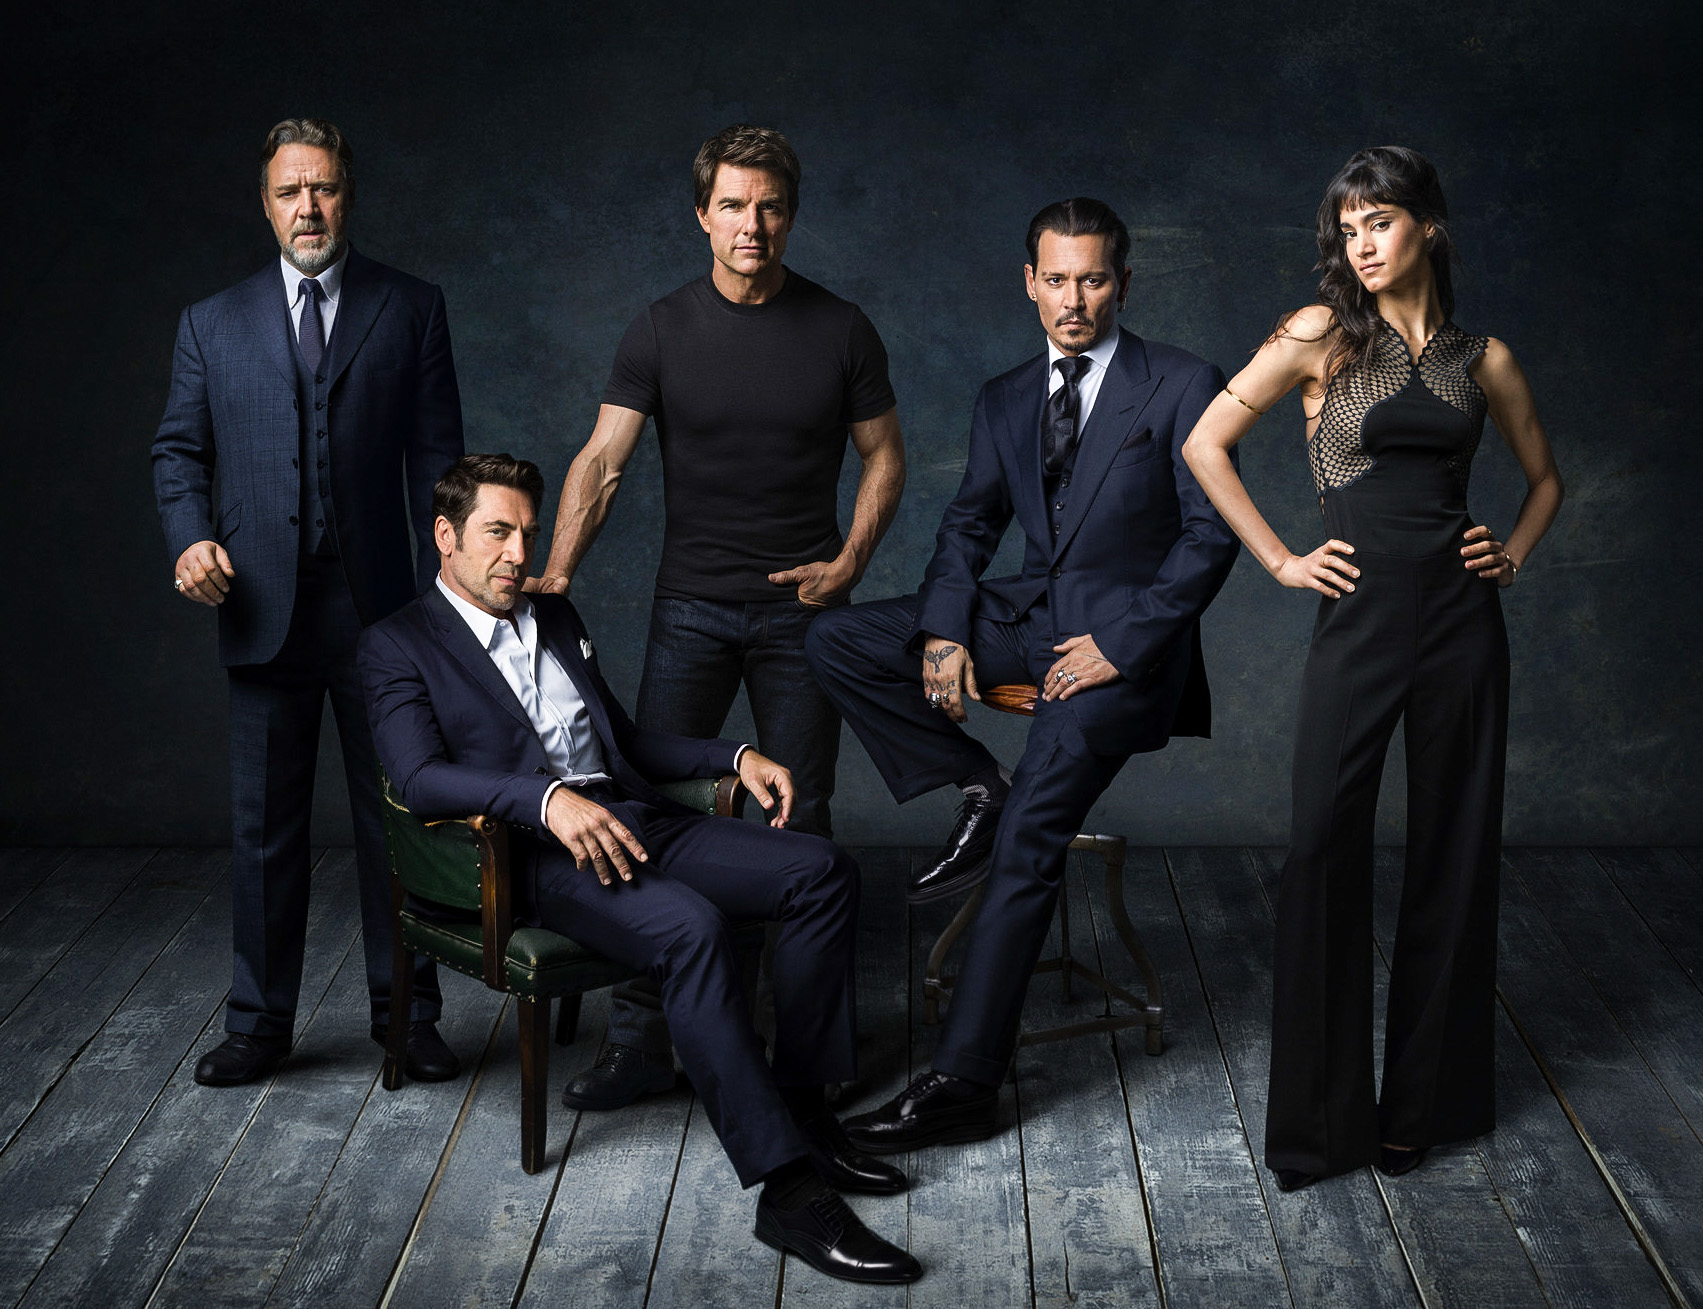 RUSSEL CROWE, JAVIER BARDEM, TOM CRUISE, JOHNNY DEPP & SOPHIA BOUTELLA. Fotografiert für %22DARK UNIVERSE%22 in Johnny Depp's Haus, Hollywood.CA,_.jpg